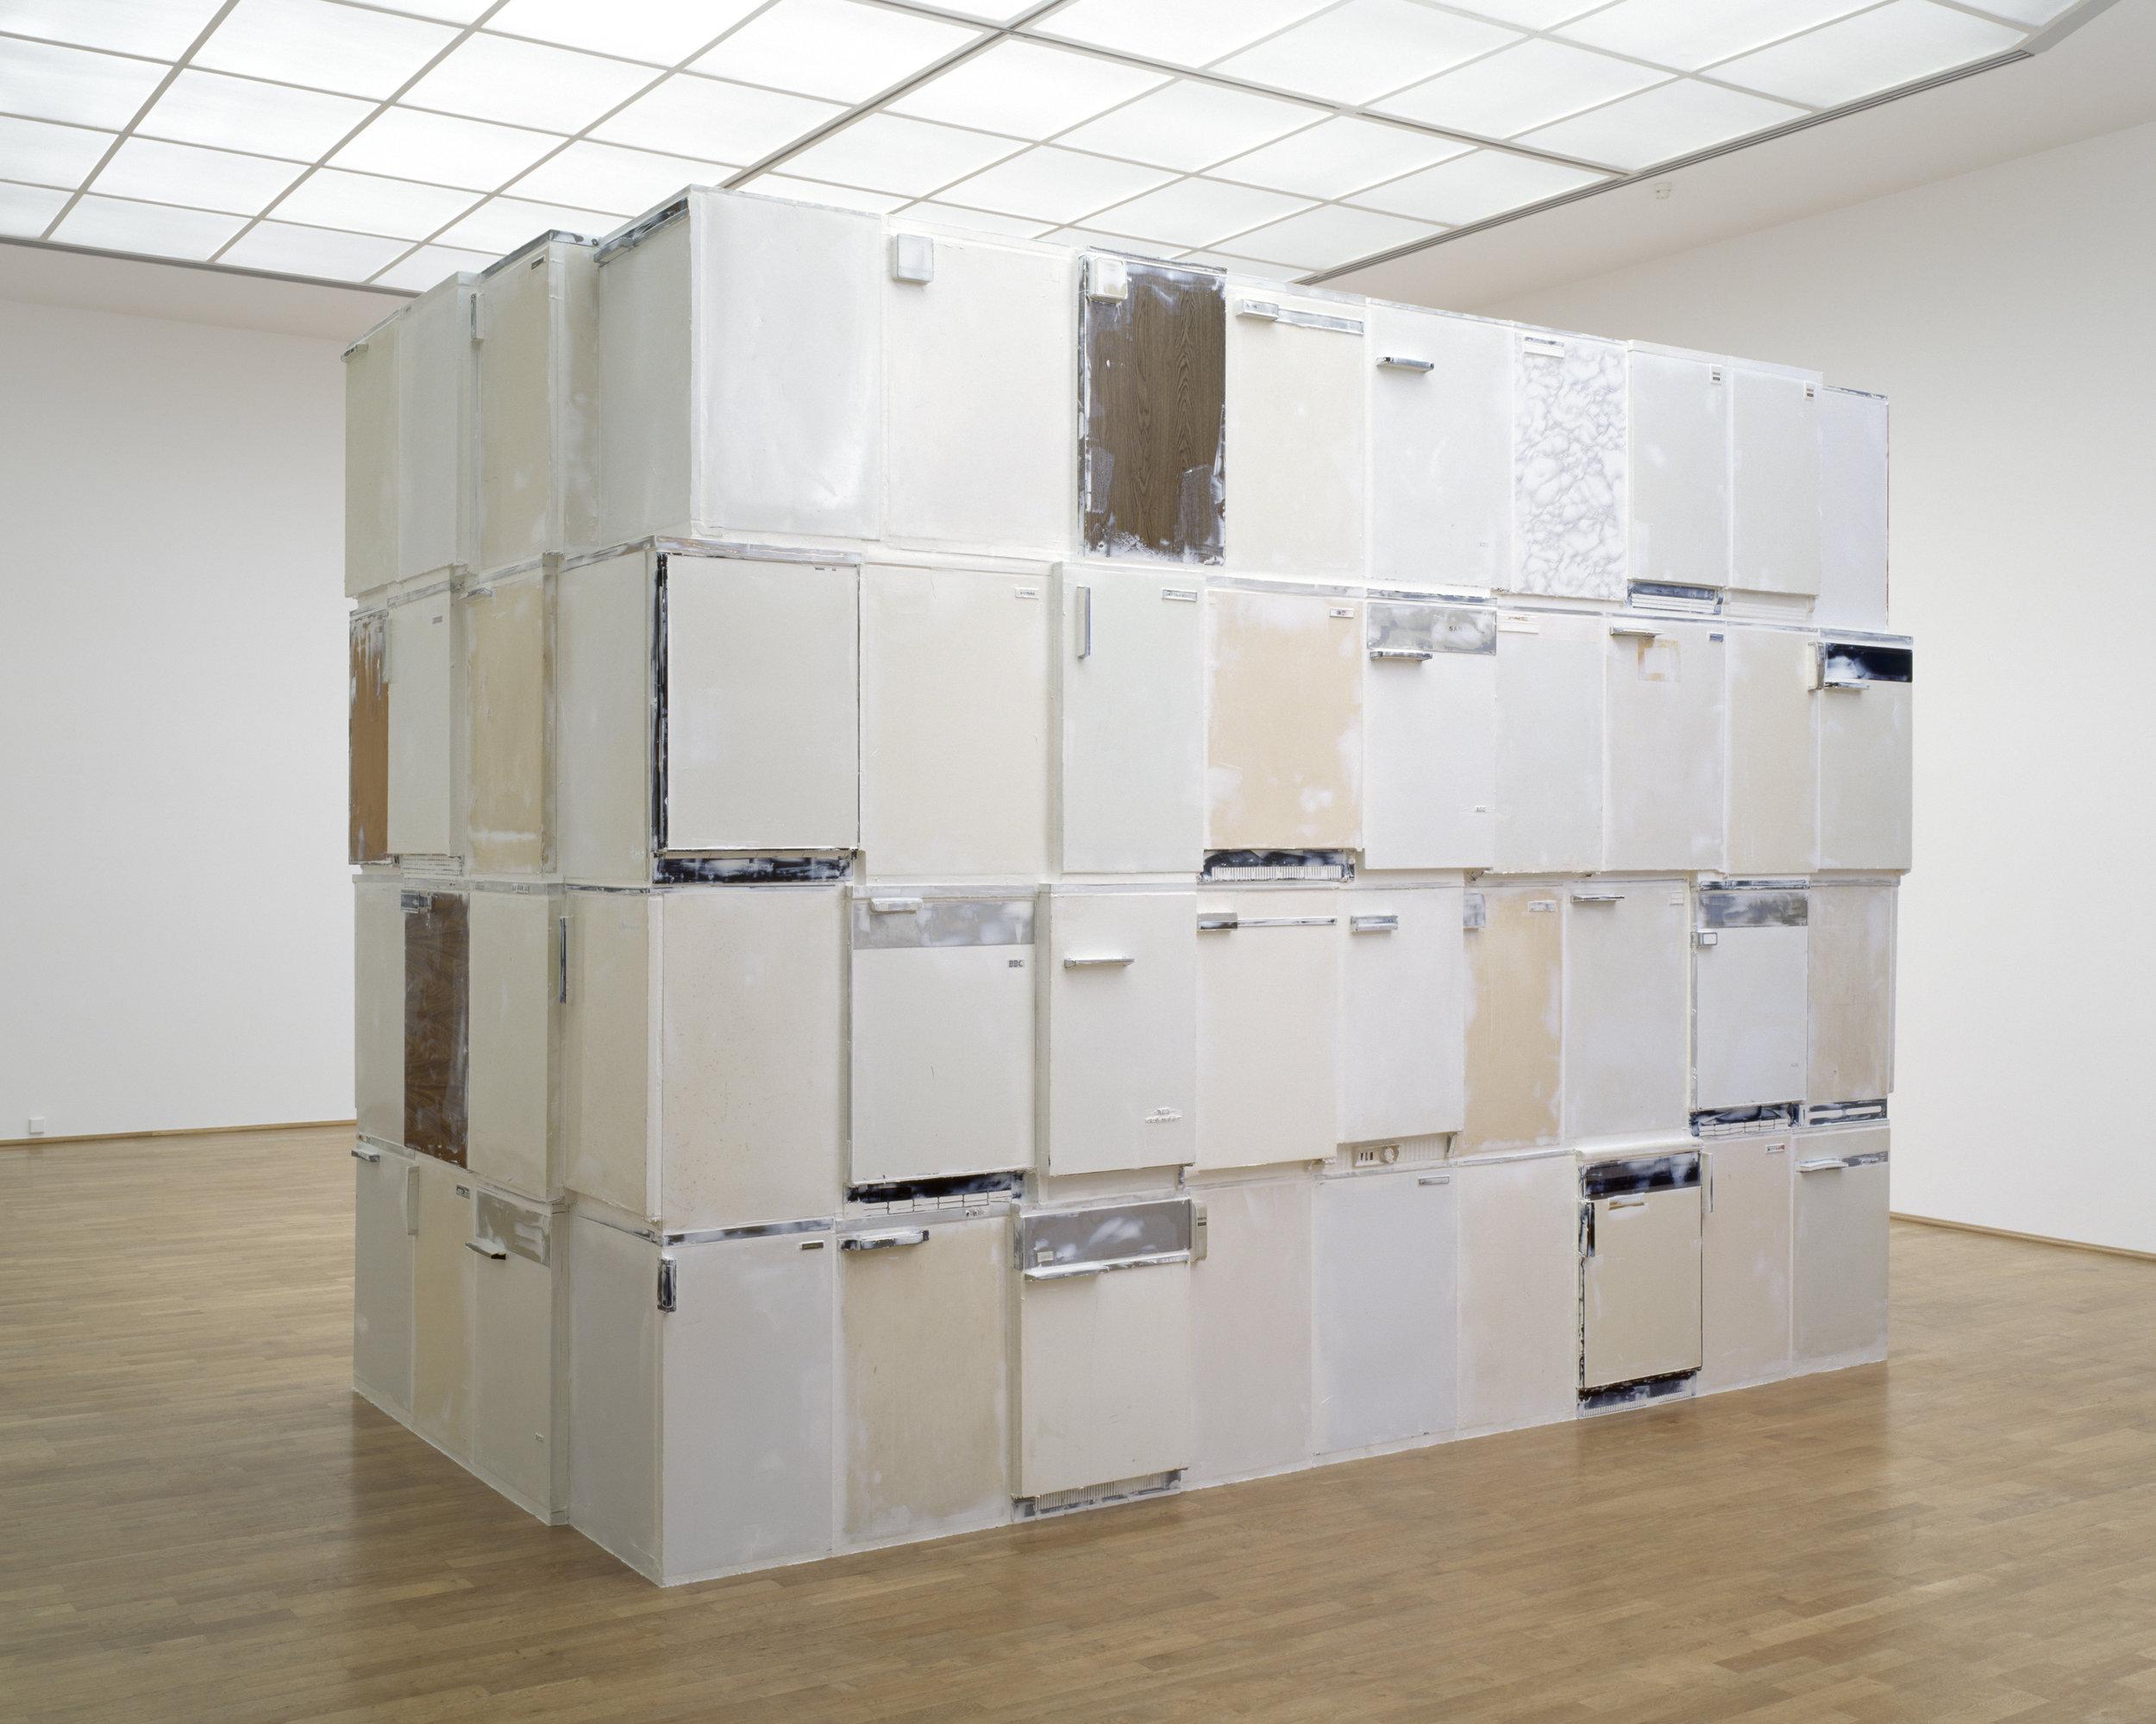 Thomas Rentmeister,  Santo *, 2003, Refrigerators, Penaten baby cream, 340 x 530 x 240 cm, Exhibition view Museum fur Moderne Kunst Frankfurt am Main, 2004. Photo: Axel Schneider, Image Courtesy of the Artist and GAGPROJECTS, Adelaide